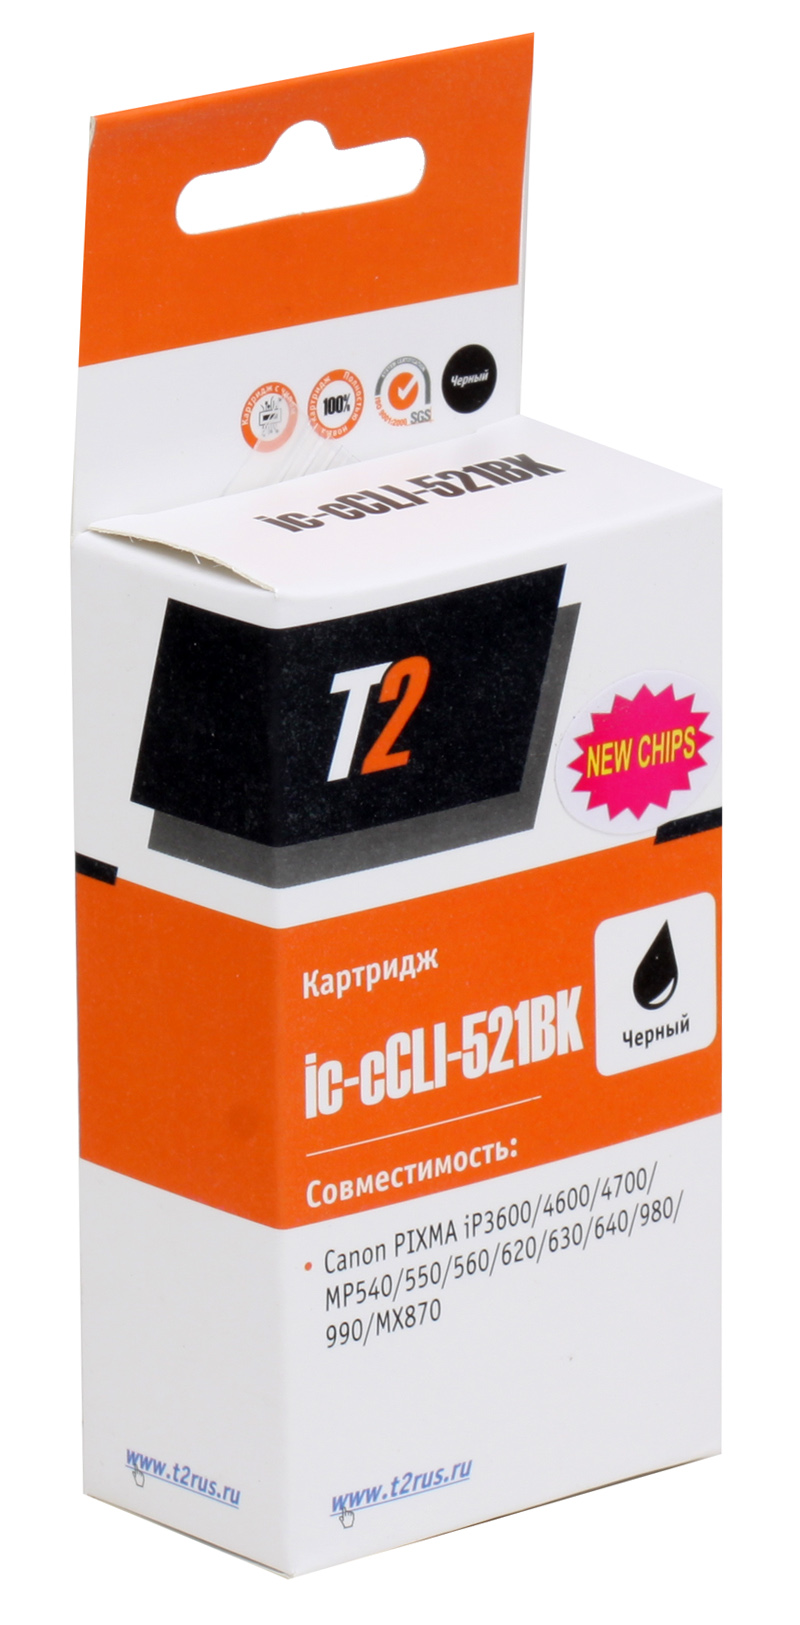 Картридж T2 IC-CCLI-521BK Black (с чипом) t2 ic ccli 426y